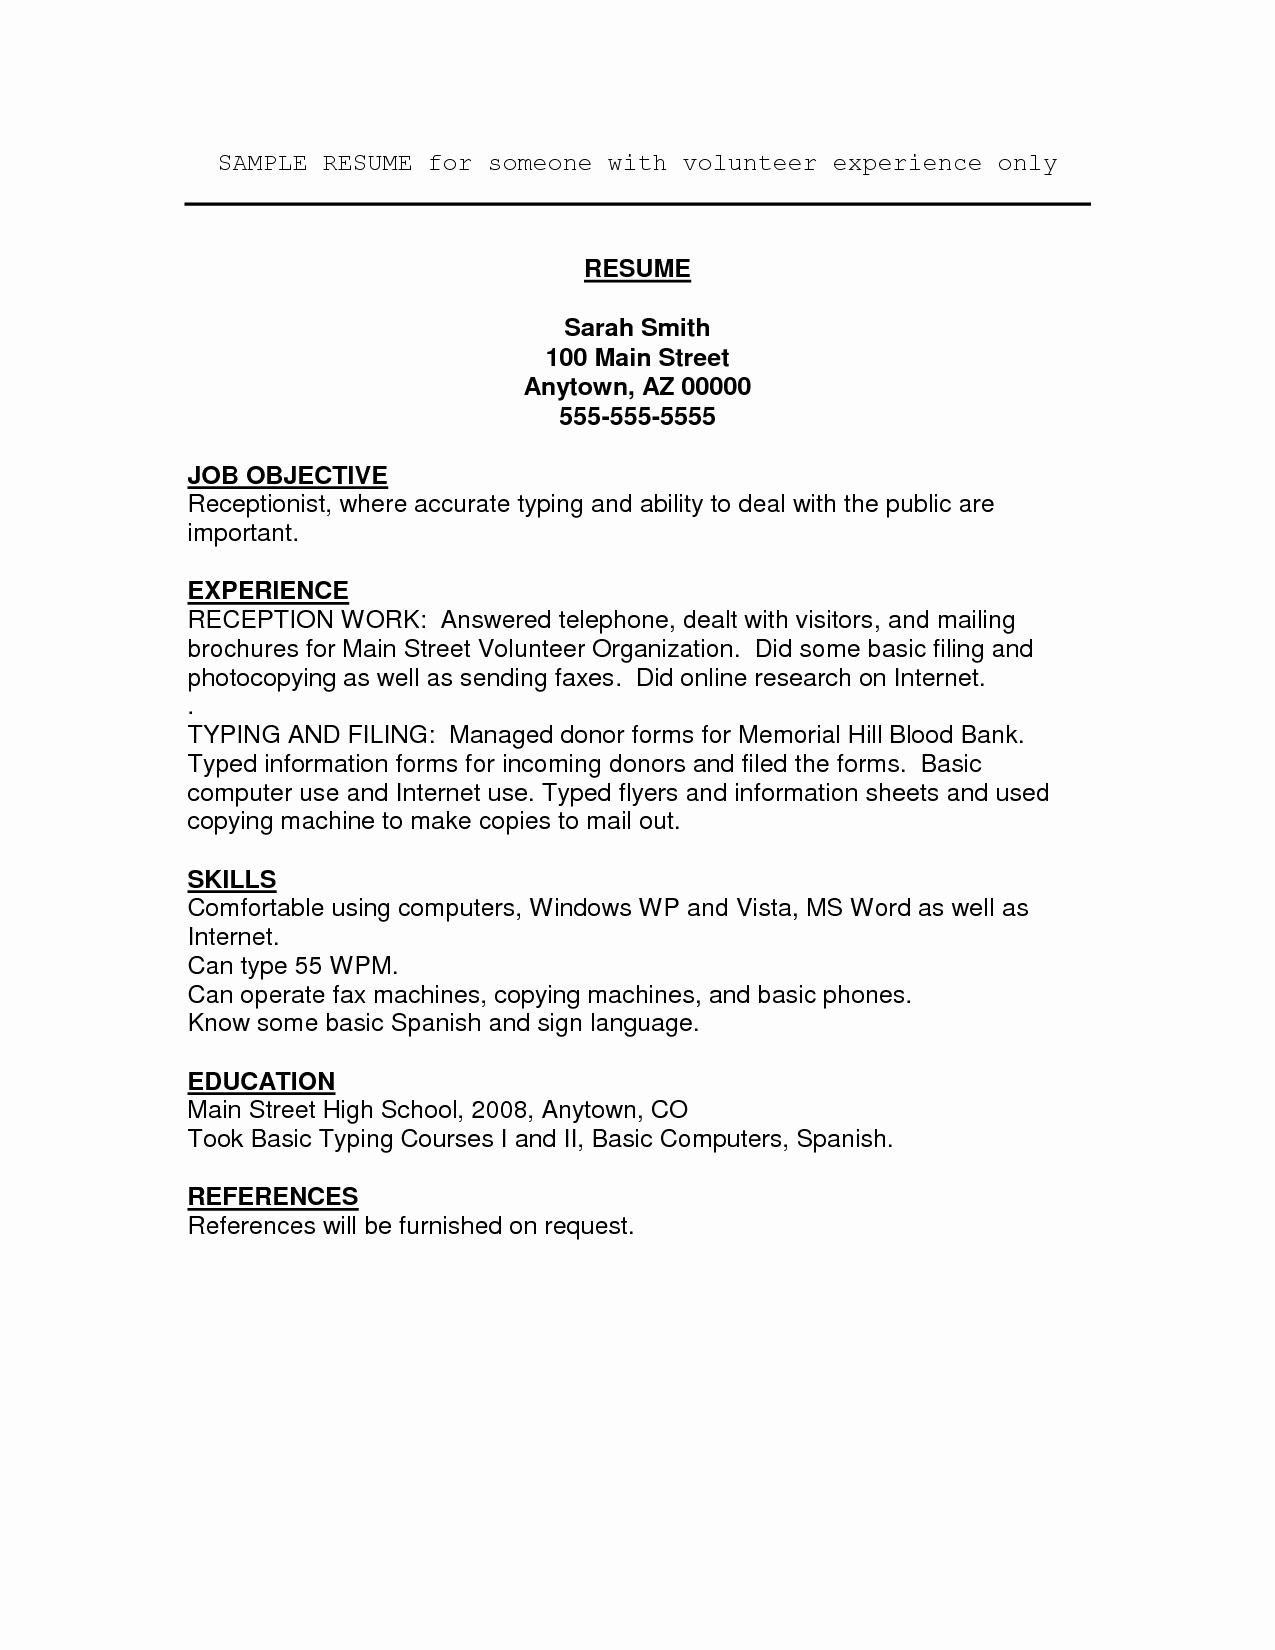 Job Resume Volunteer Experience Umecareer